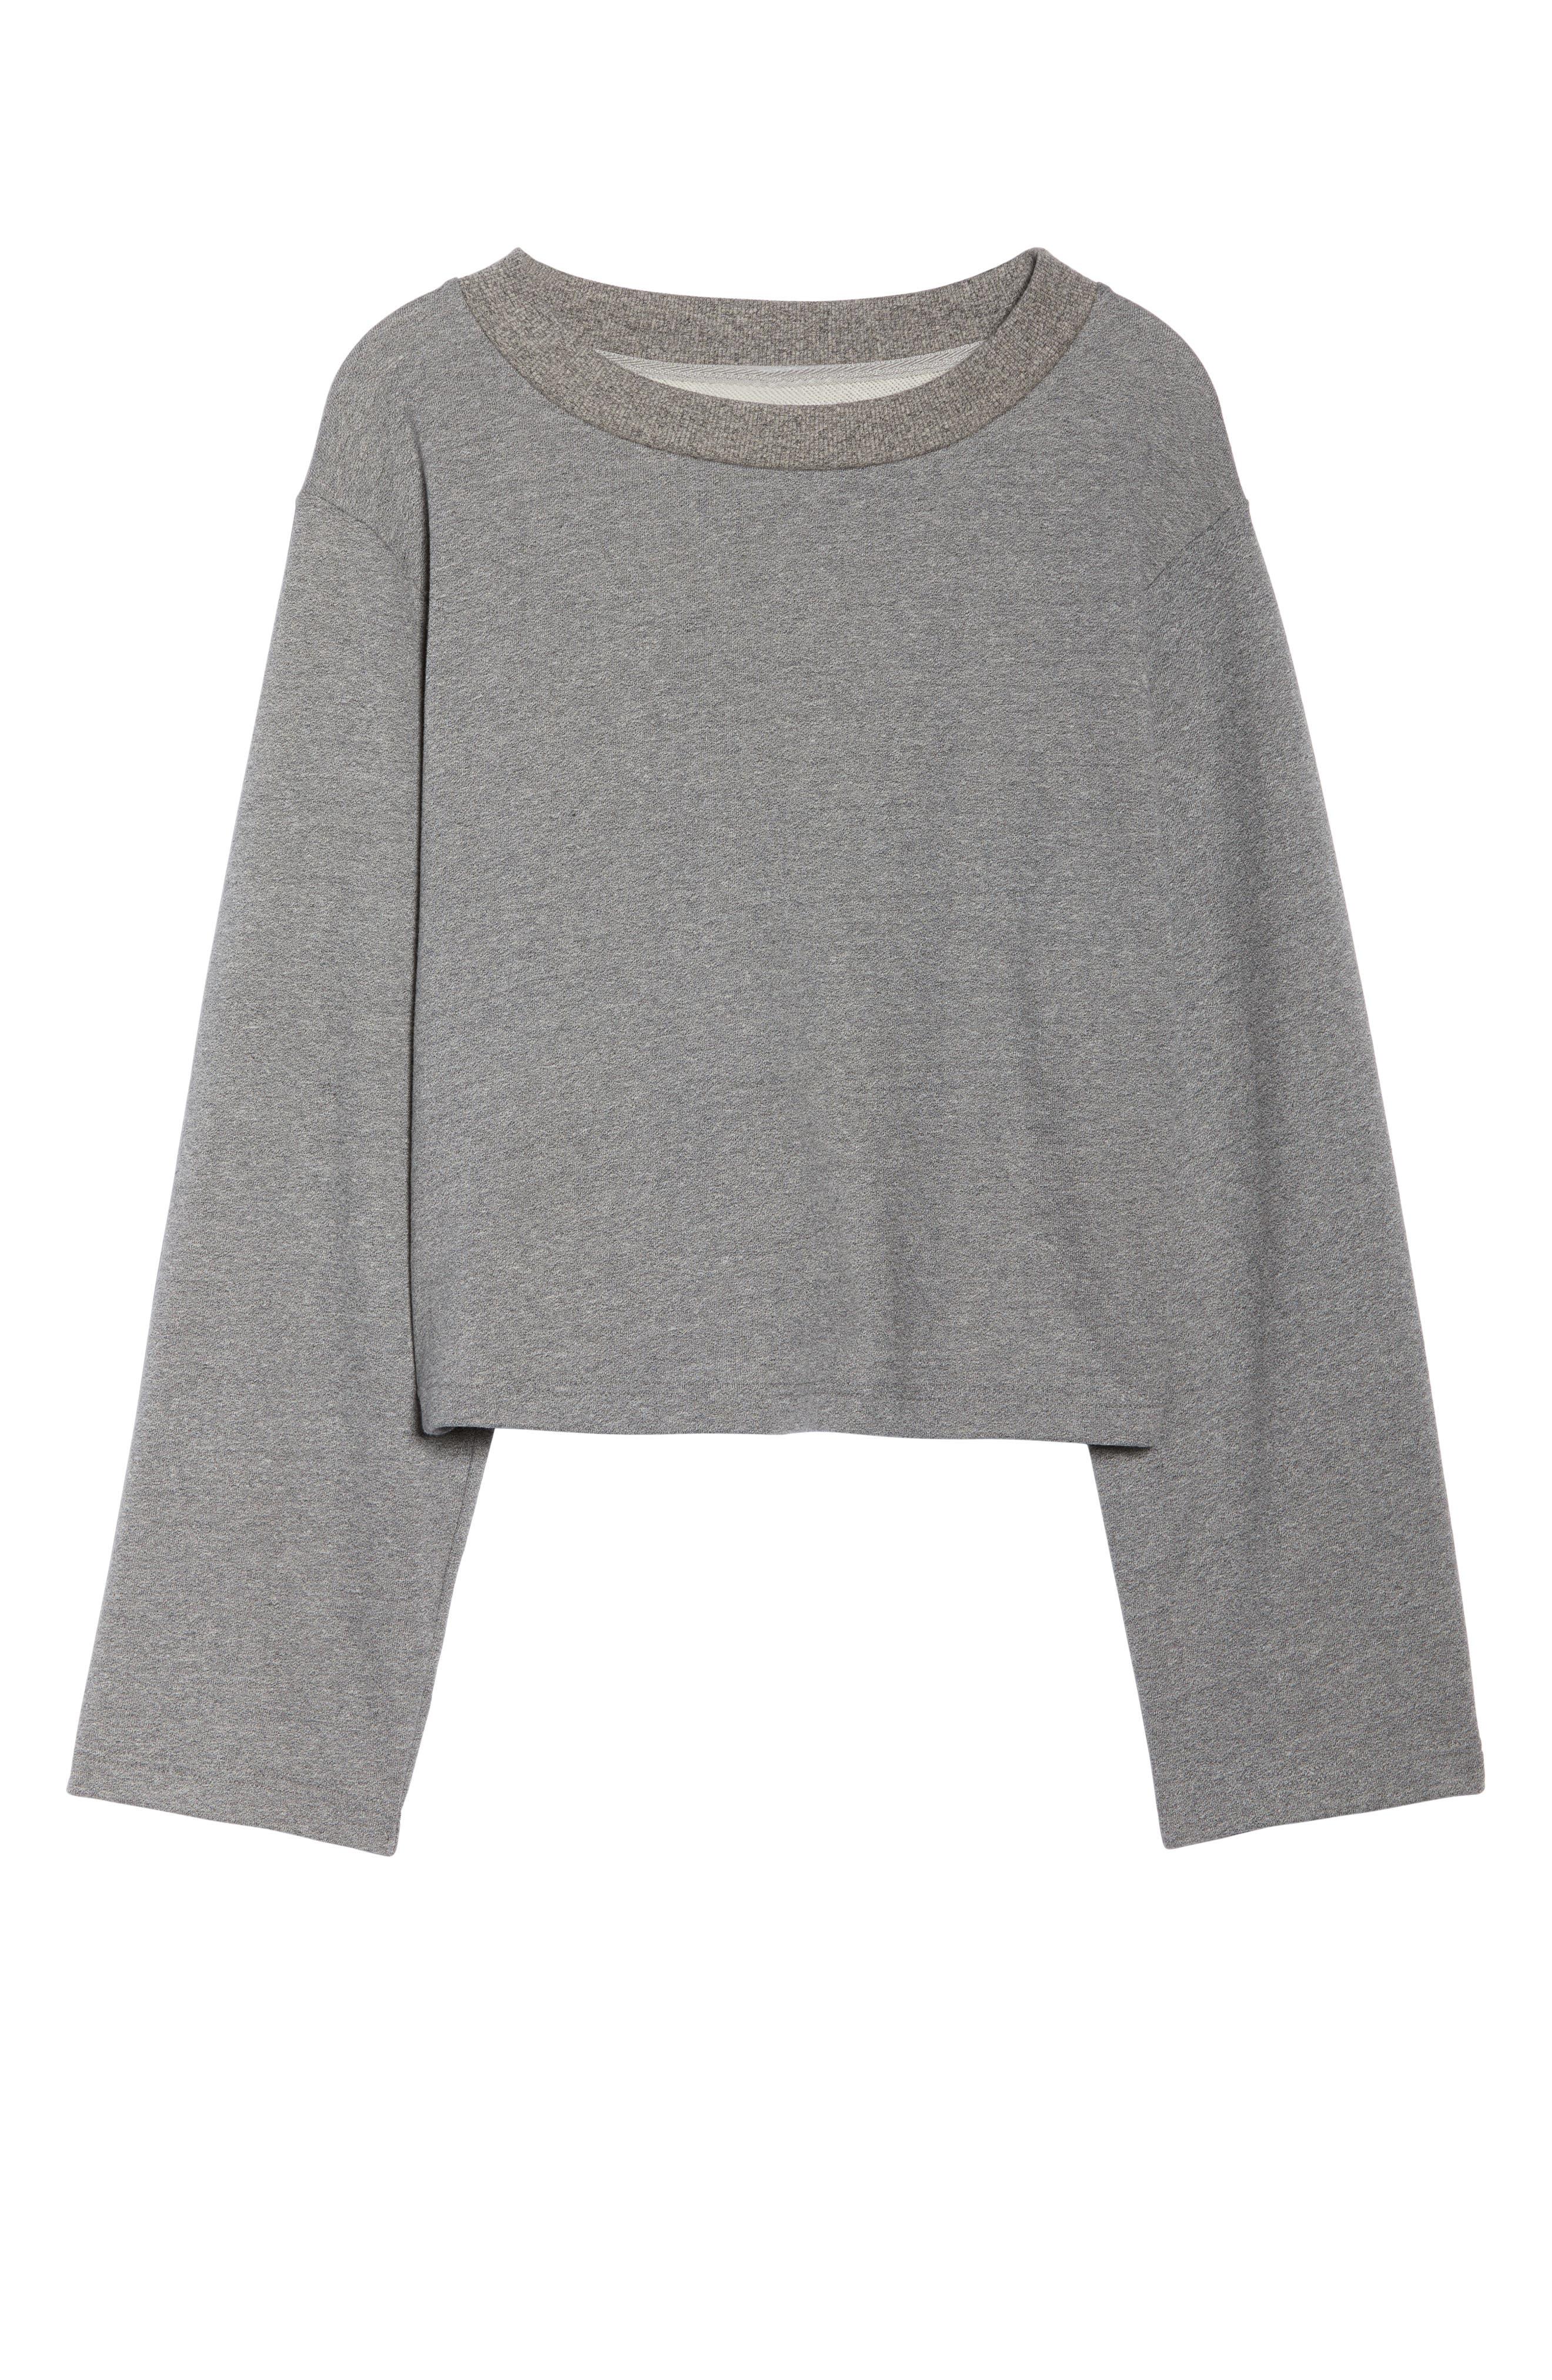 Weymouth Sweatshirt,                             Alternate thumbnail 7, color,                             DARK GREY